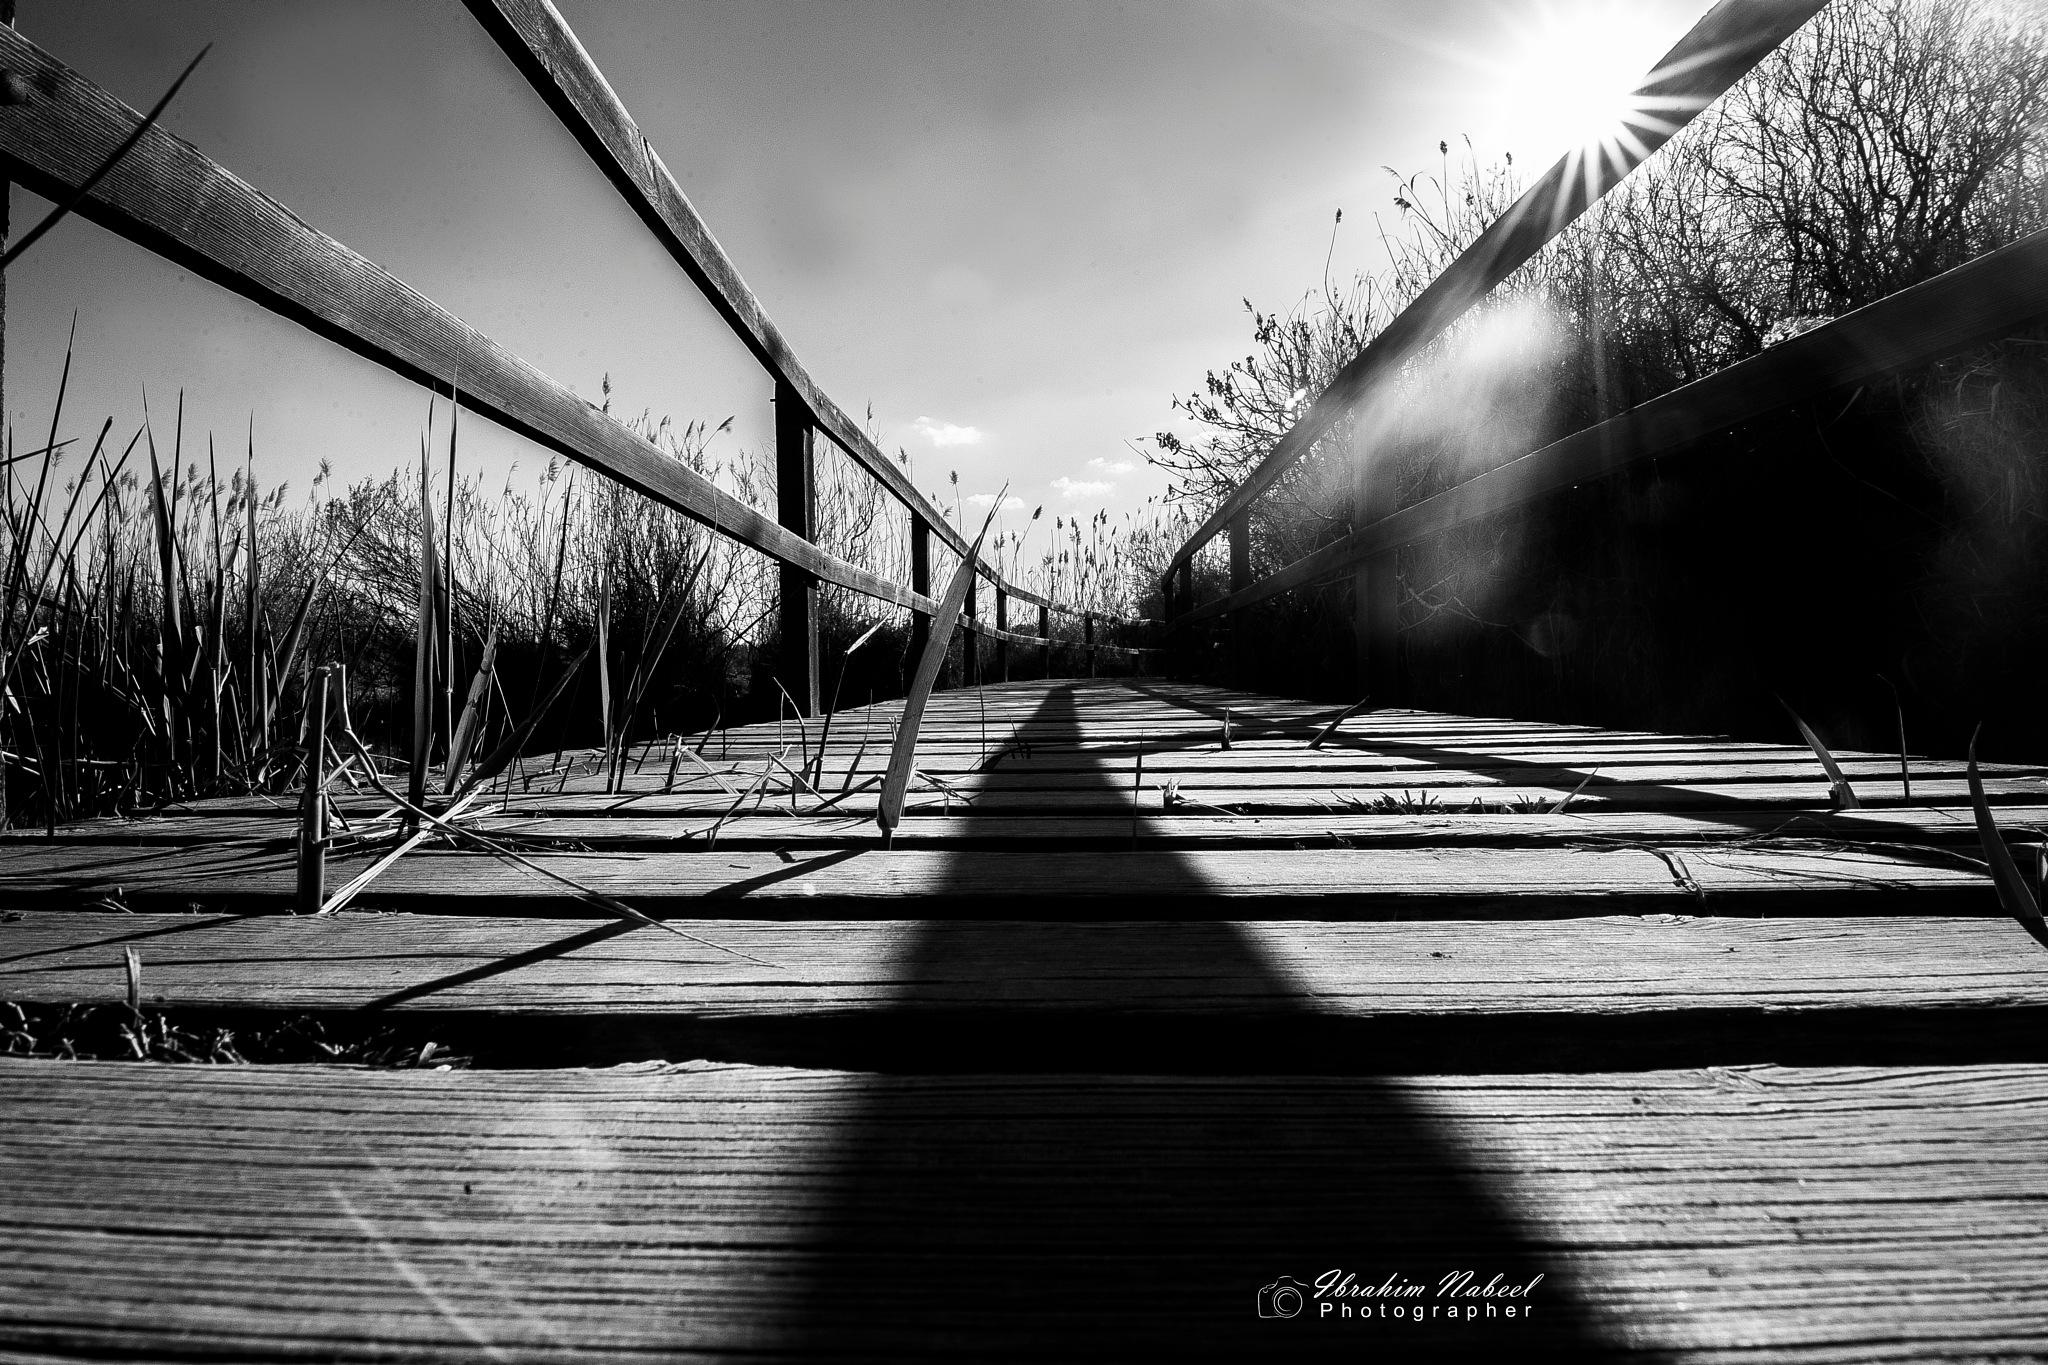 Short road by Ibrahim Nabeel